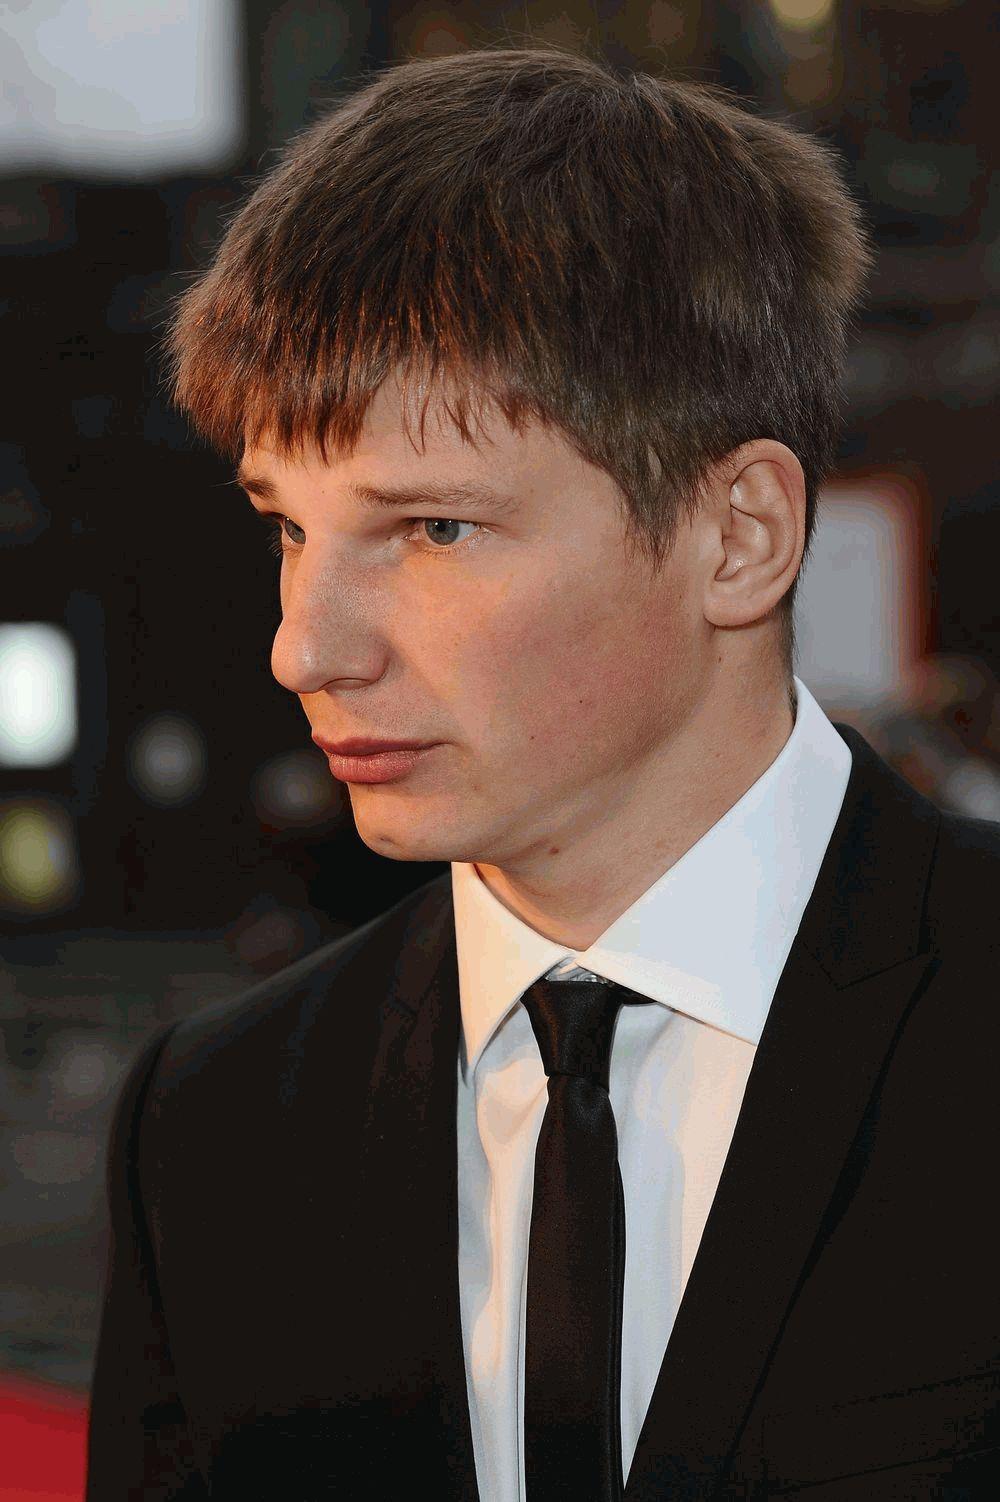 Андрей Аршавин в костюме